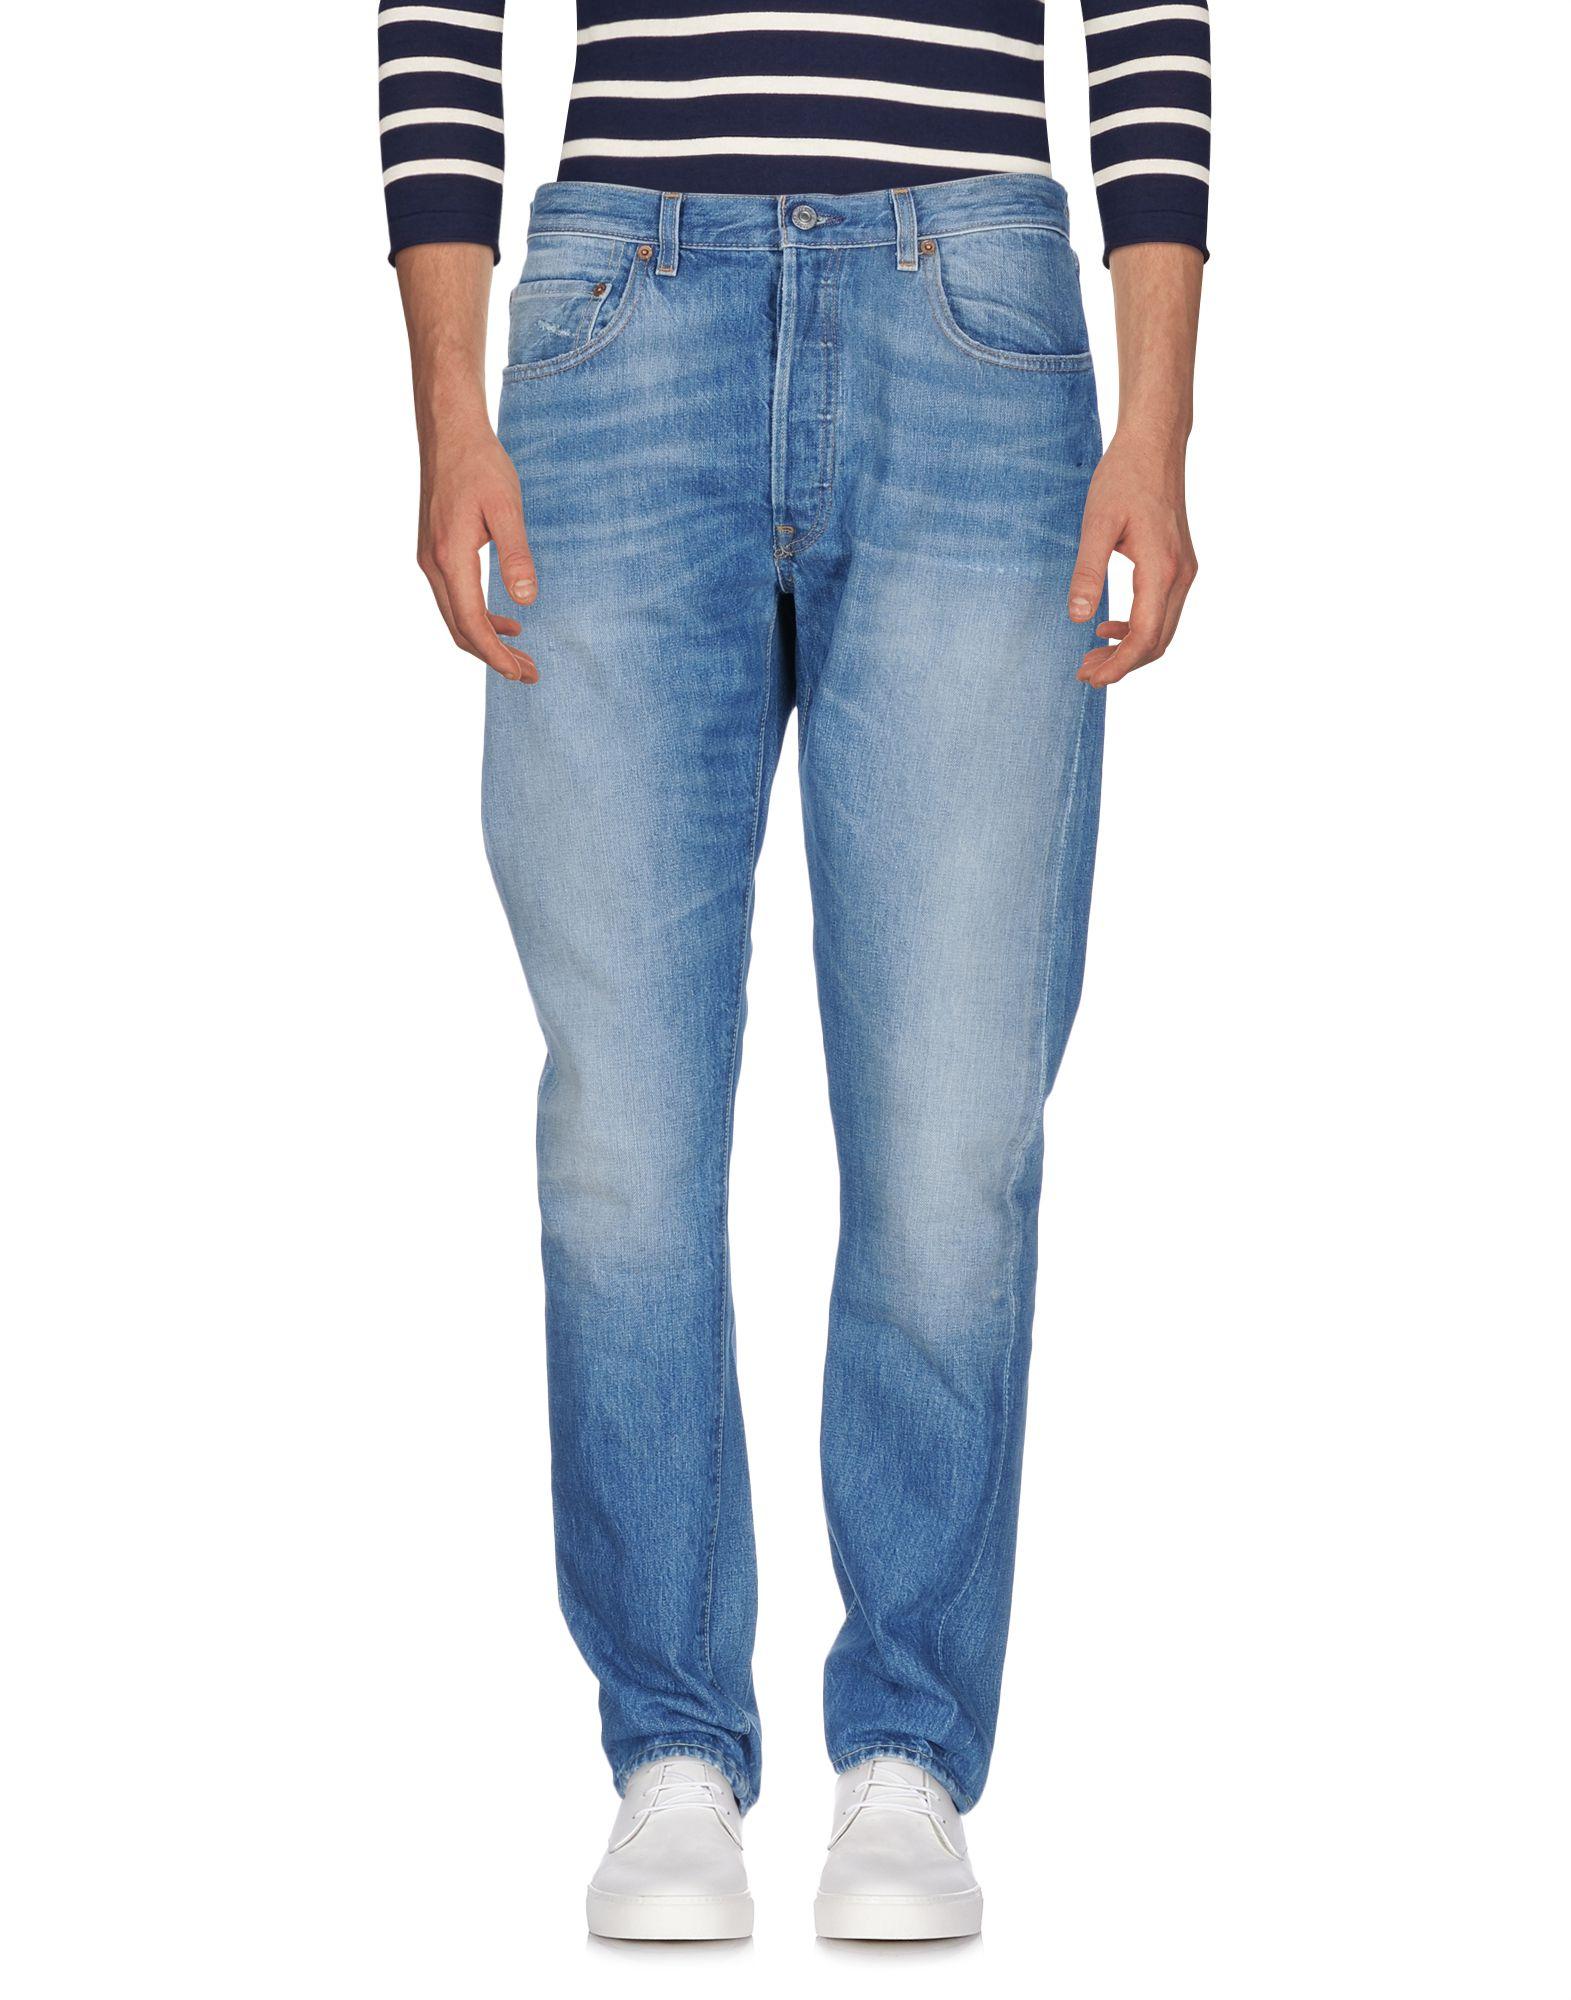 Pantaloni Jeans Levis Vintage Clothing Uomo - Acquista online su